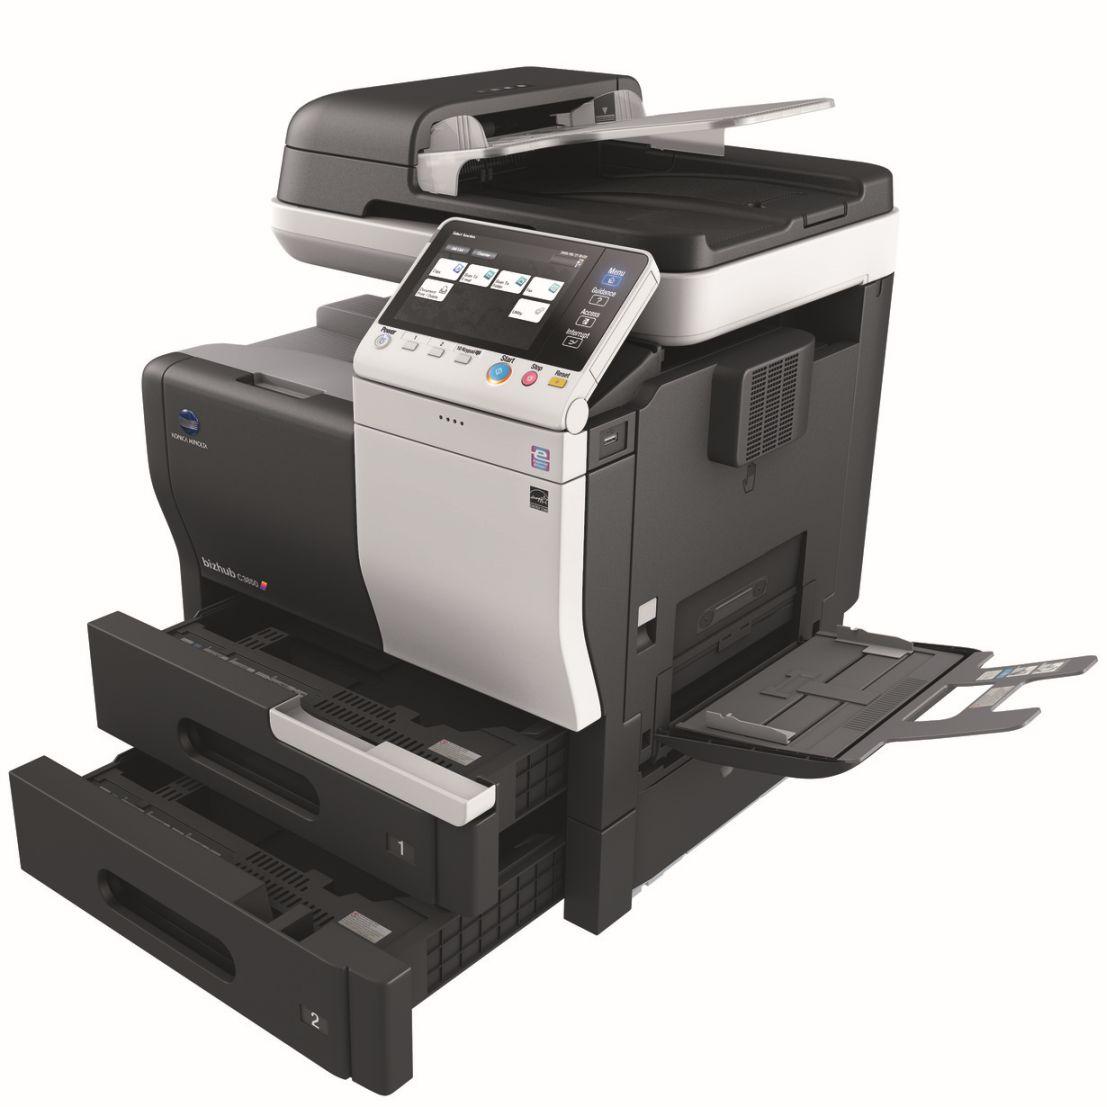 Konica Minolta Bizhub C3850 Open Paper Trays Bypass Price Offers